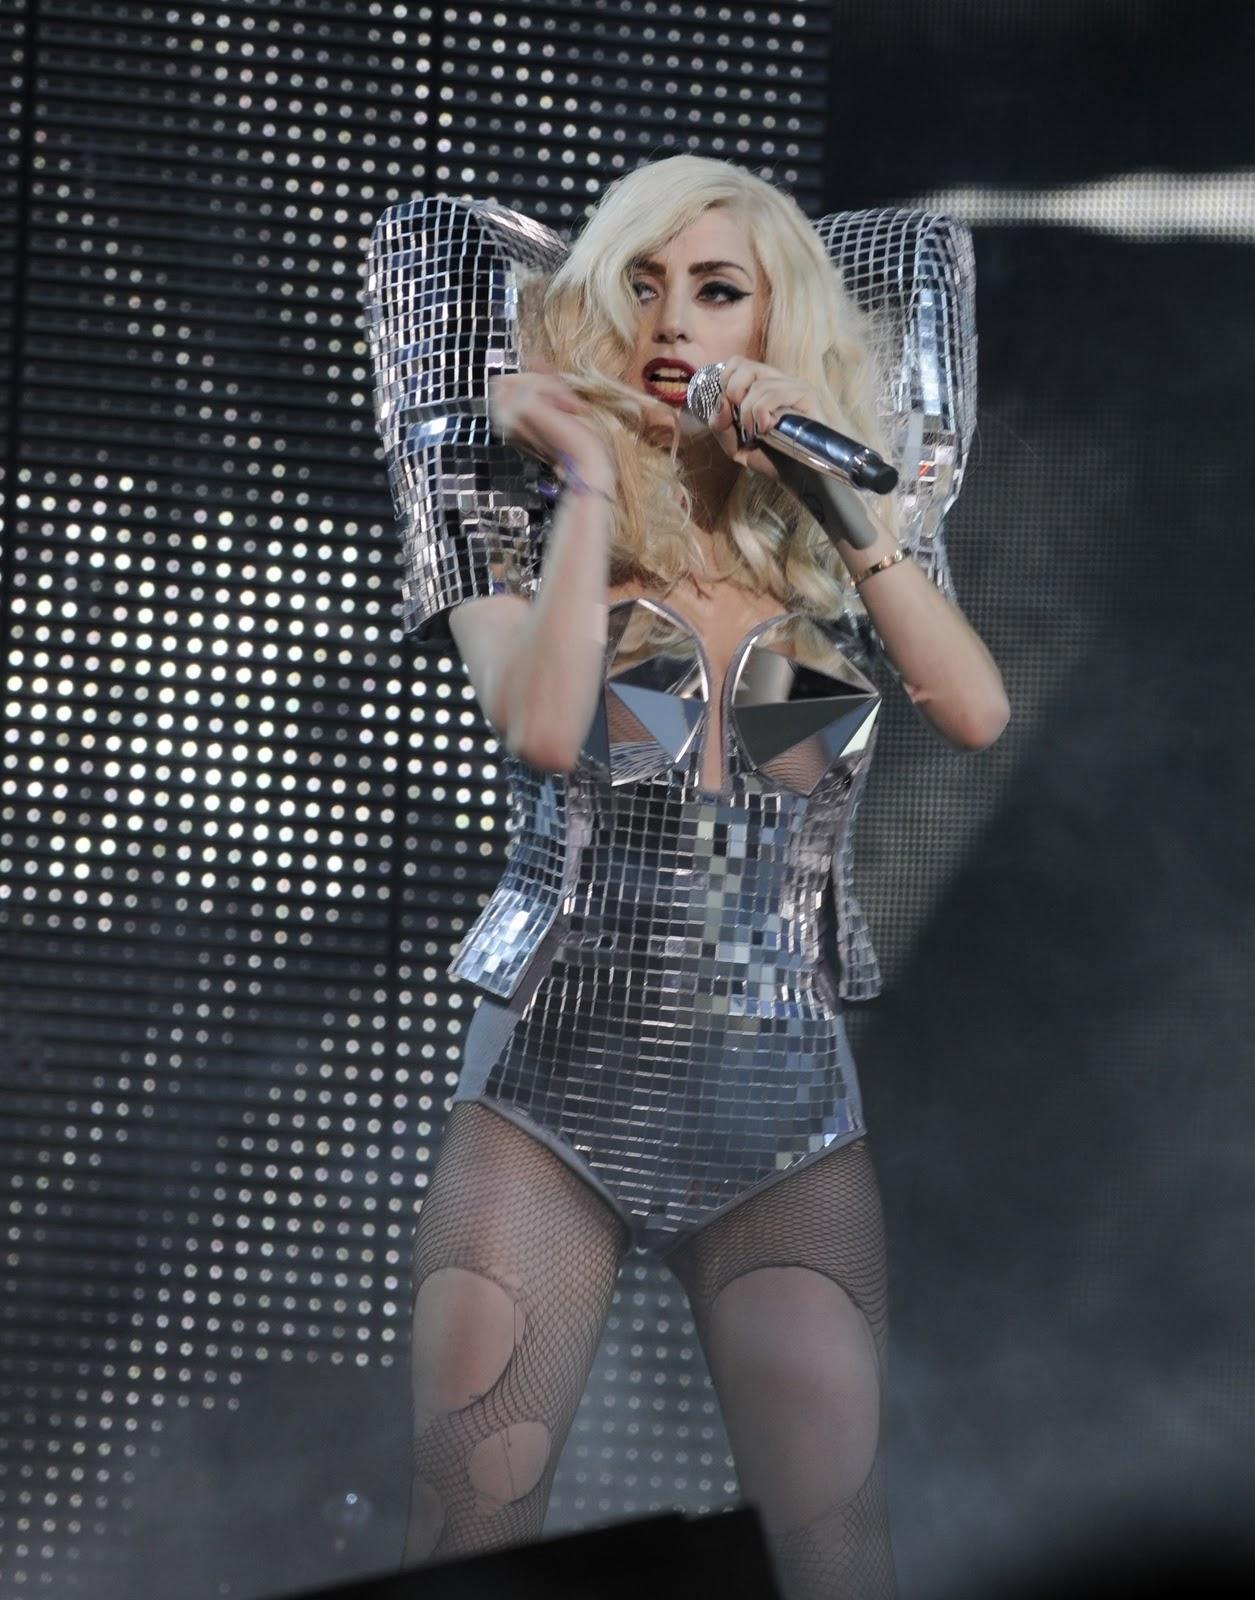 http://1.bp.blogspot.com/_JHRcPMYWdmM/TIfdOjRMvOI/AAAAAAAABSs/Twdlvzxrdo8/s1600/Lady-Gaga-Monster-Ball-Tour-L-A-lad.jpg